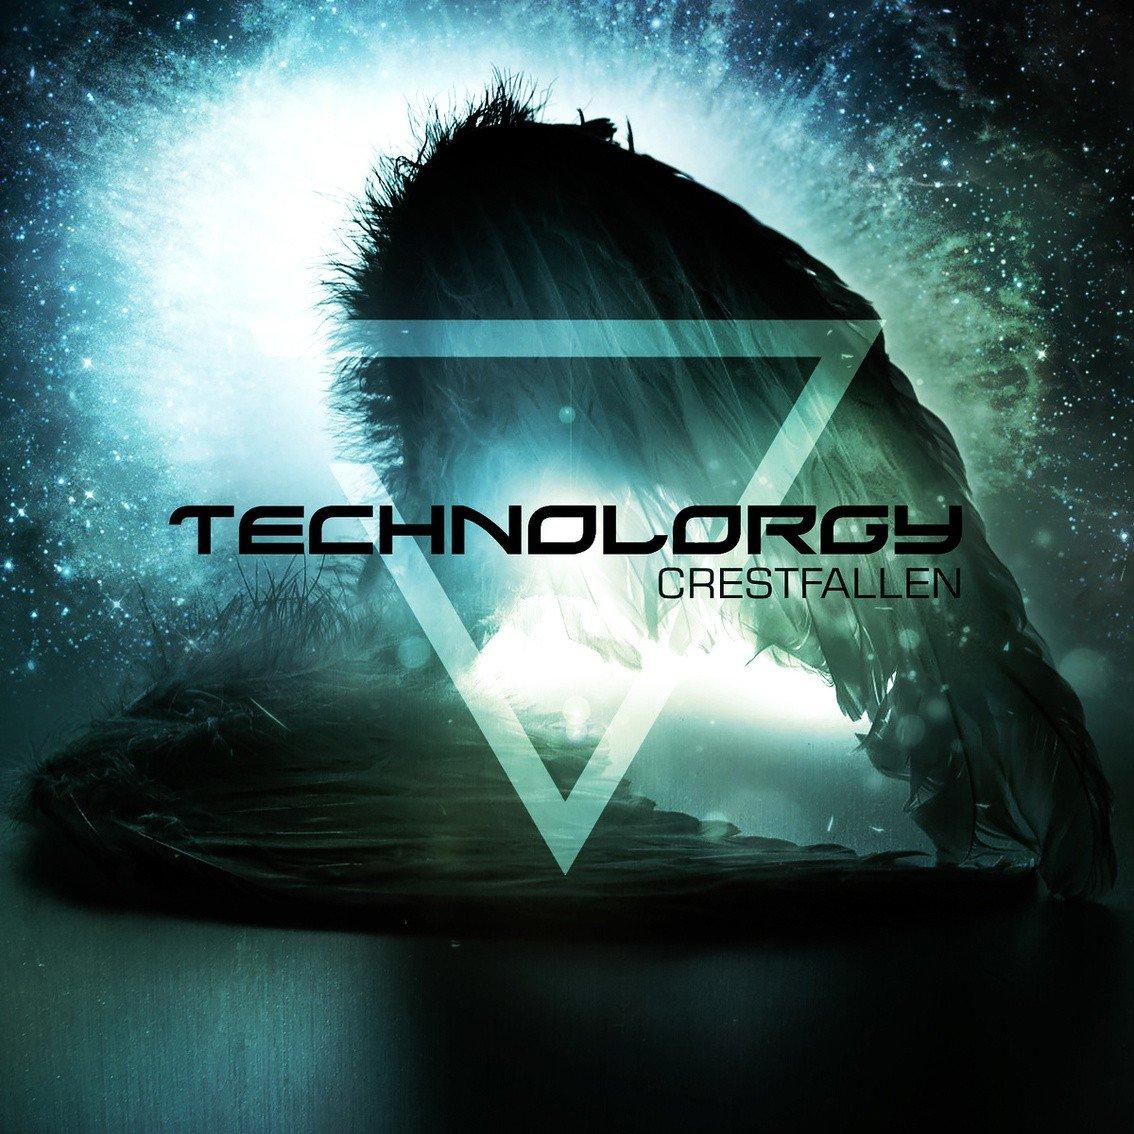 Technolorgy's 4-track single 'Crestfallen' out as digital release